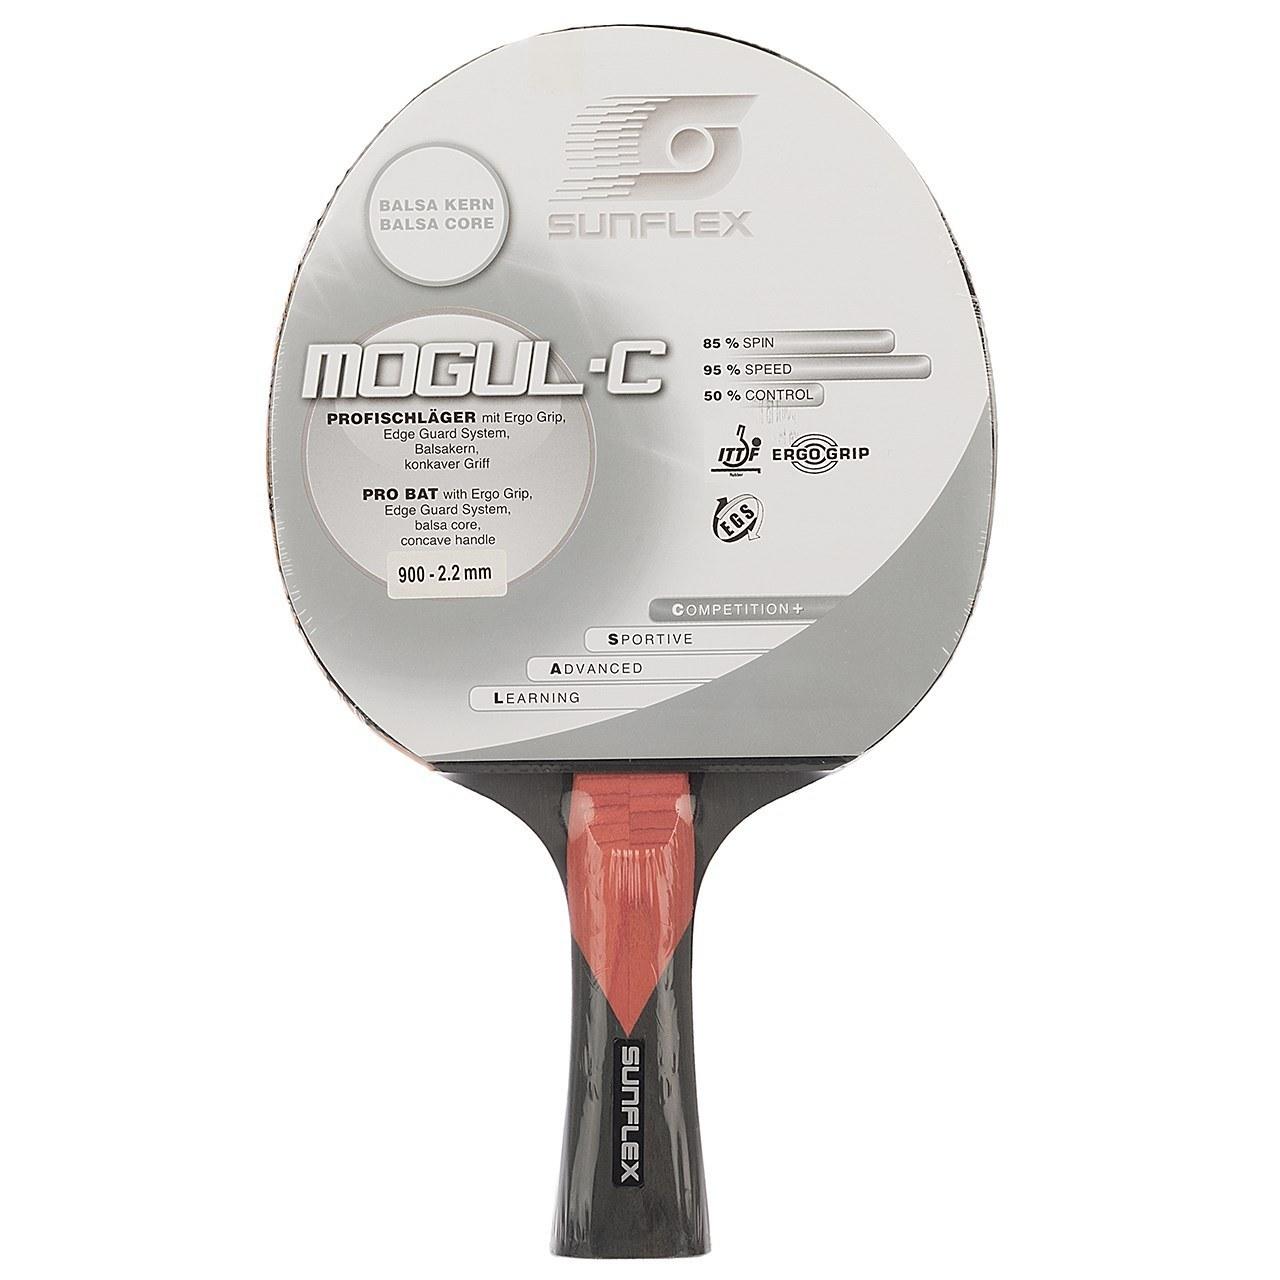 راکت پينگ پنگ سان فلکس مدل Mogul-C Level 900 | Sunflex Mogul-C Level 900 Ping Pong Racket